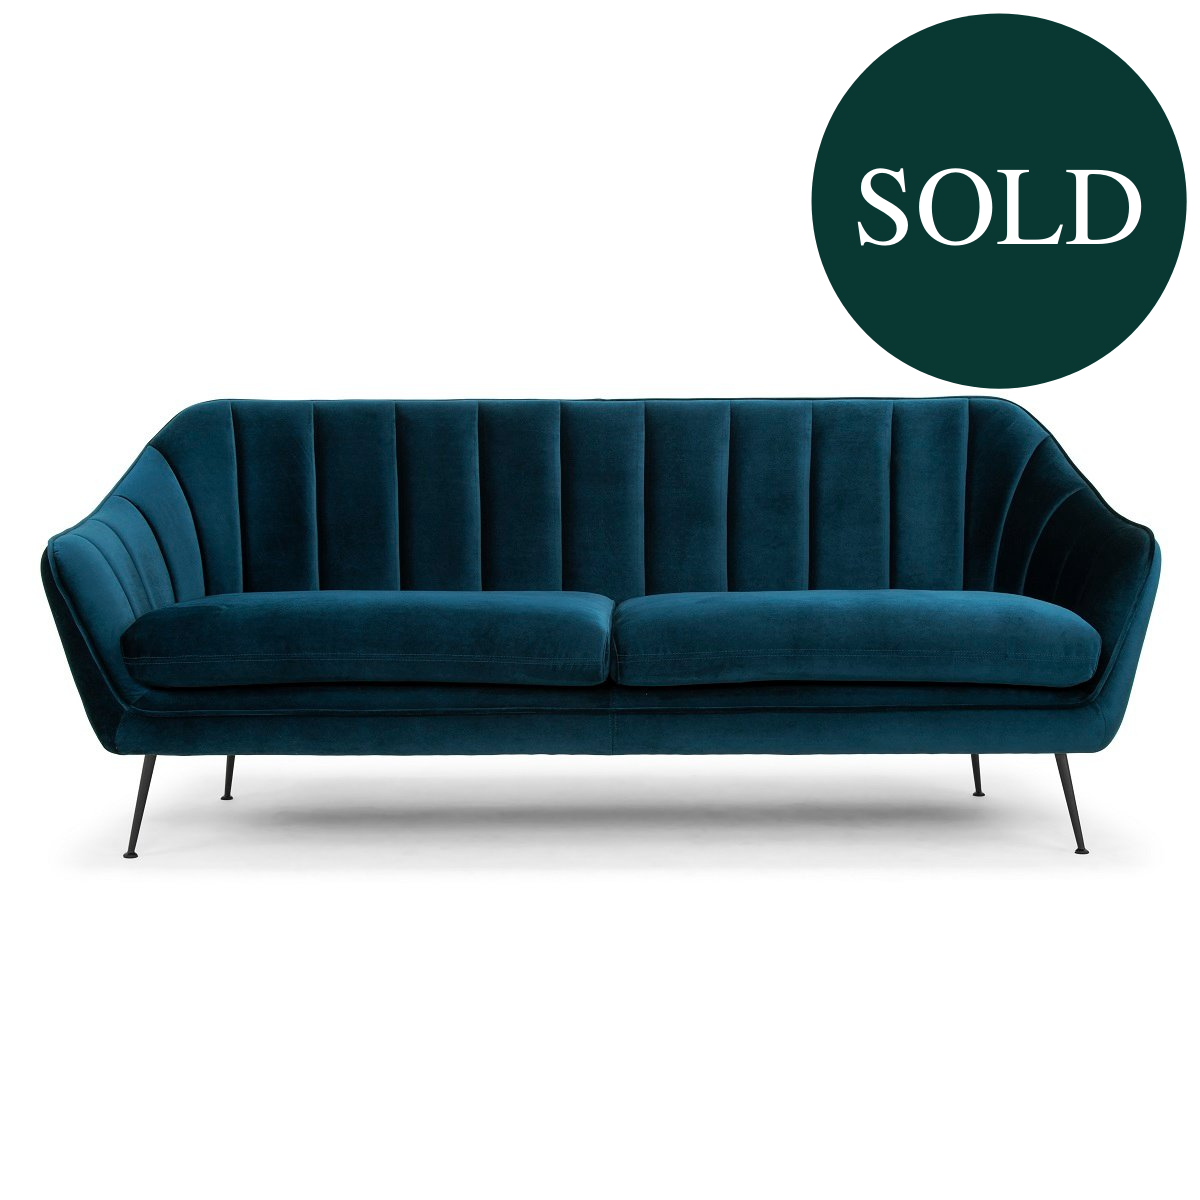 Noah 3 Seater Sofa